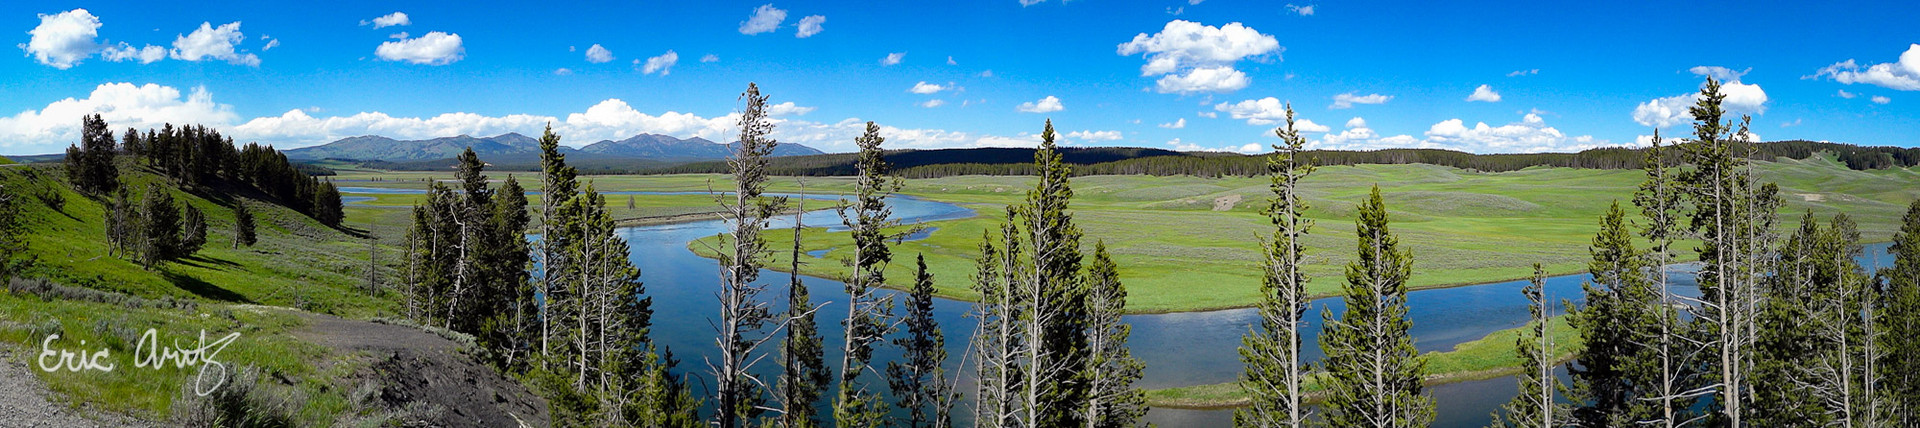 Hayden Valley Panorama, Yellowstone